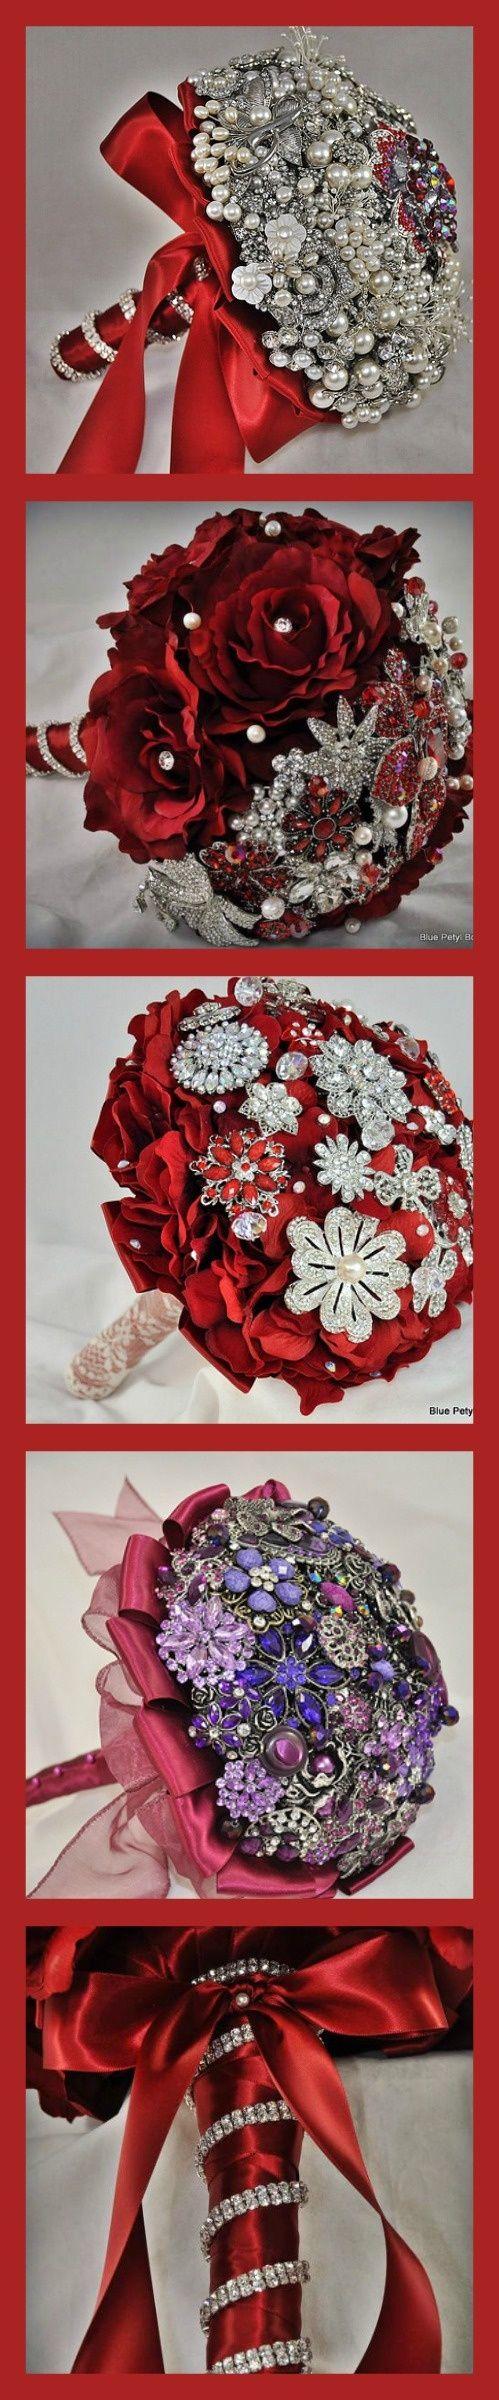 Red brooch bouquets by Blue Petyl